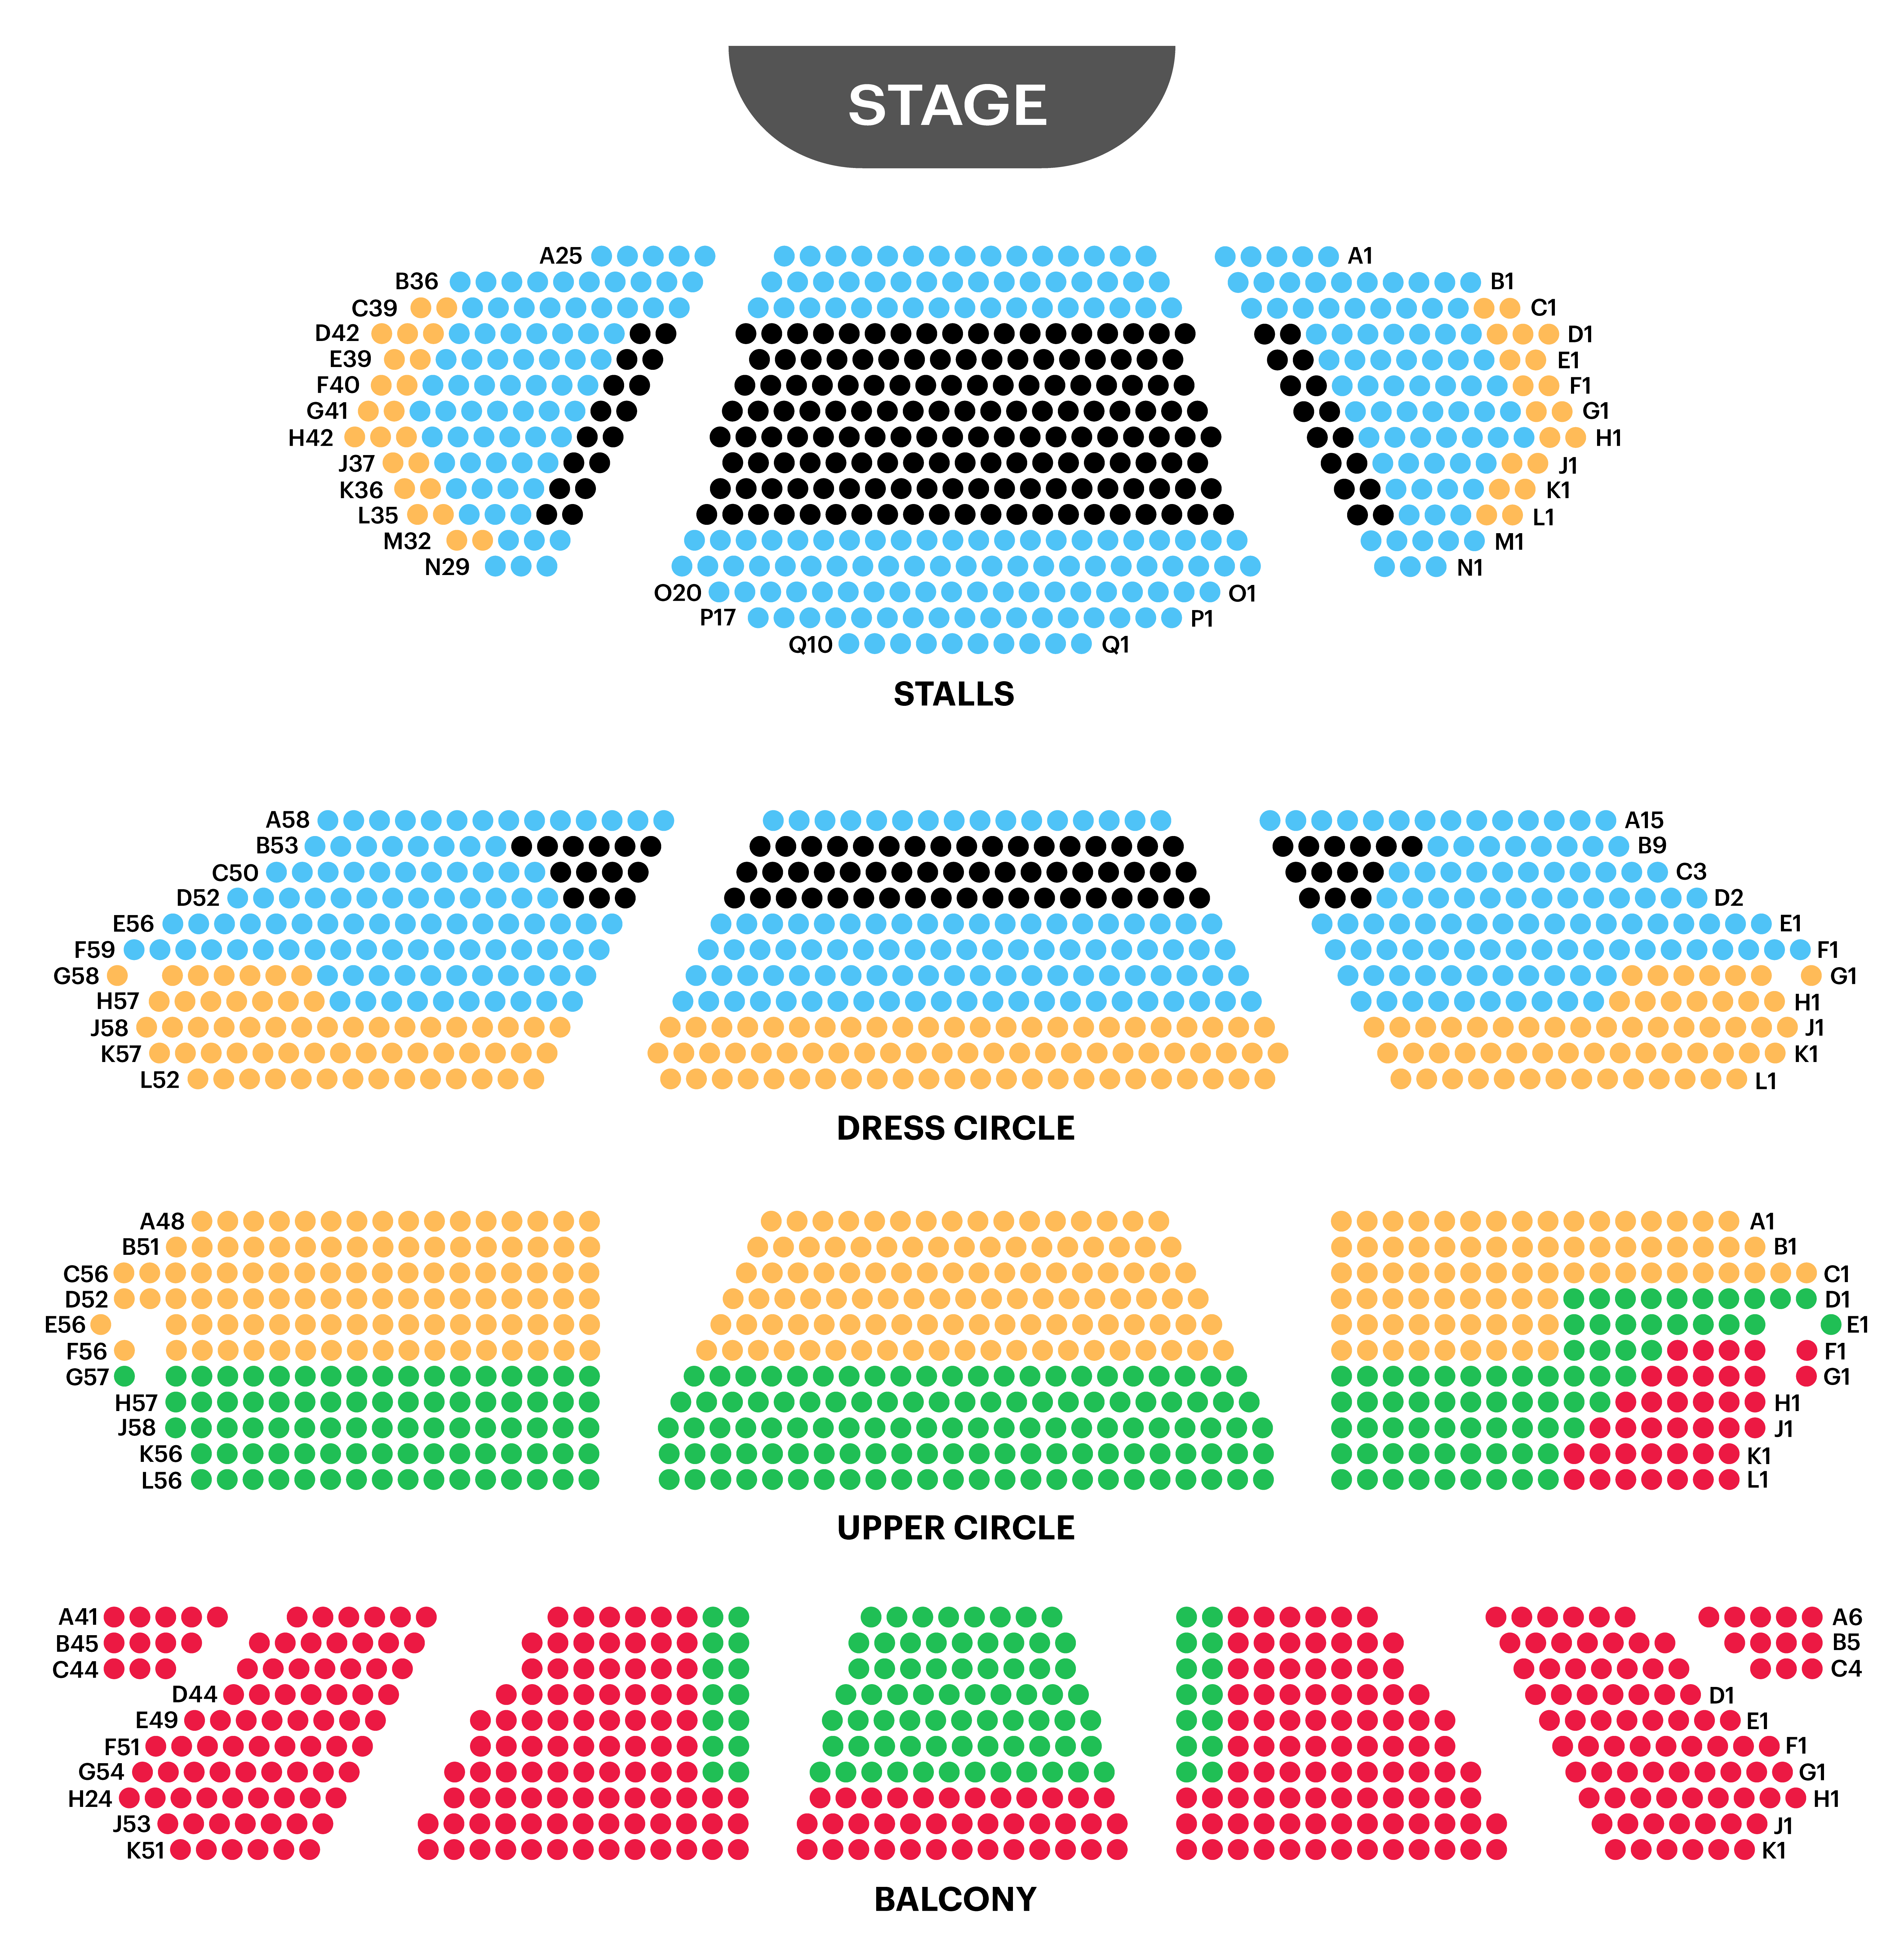 London Coliseum Seating Map